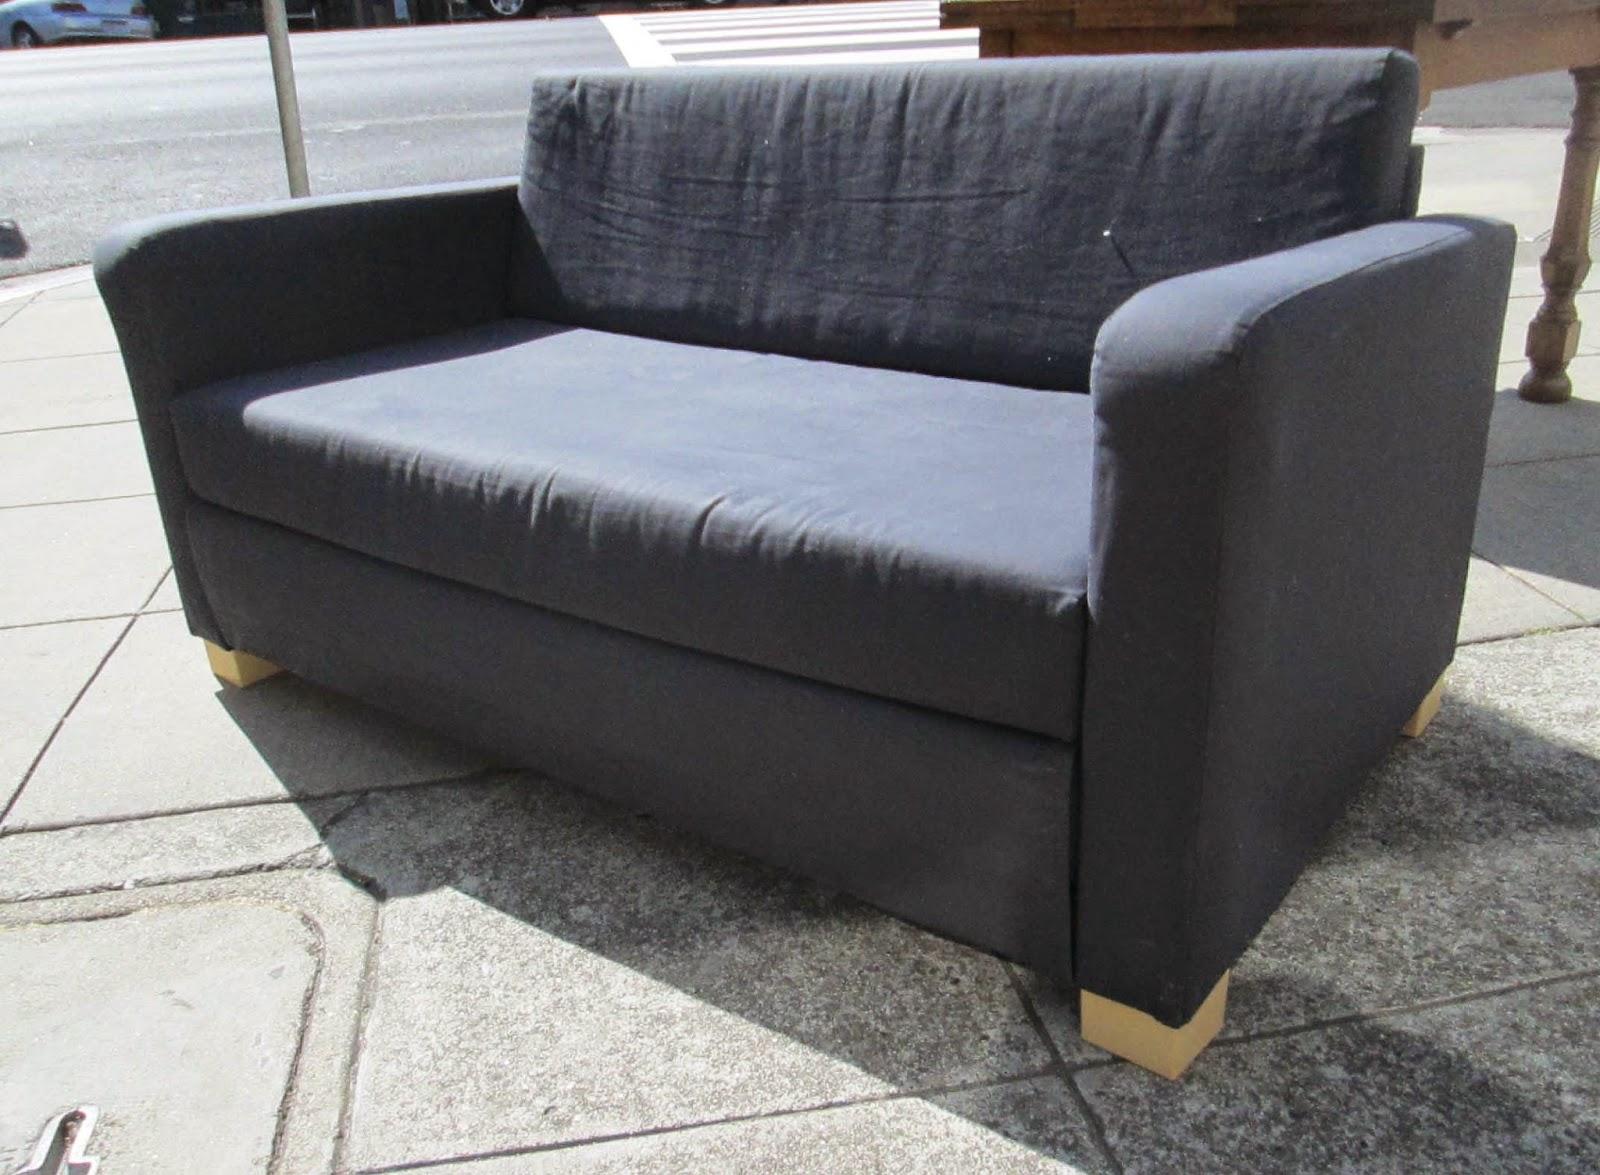 Uhuru Furniture Amp Collectibles Sold Ikea Solsta Sofa Bed